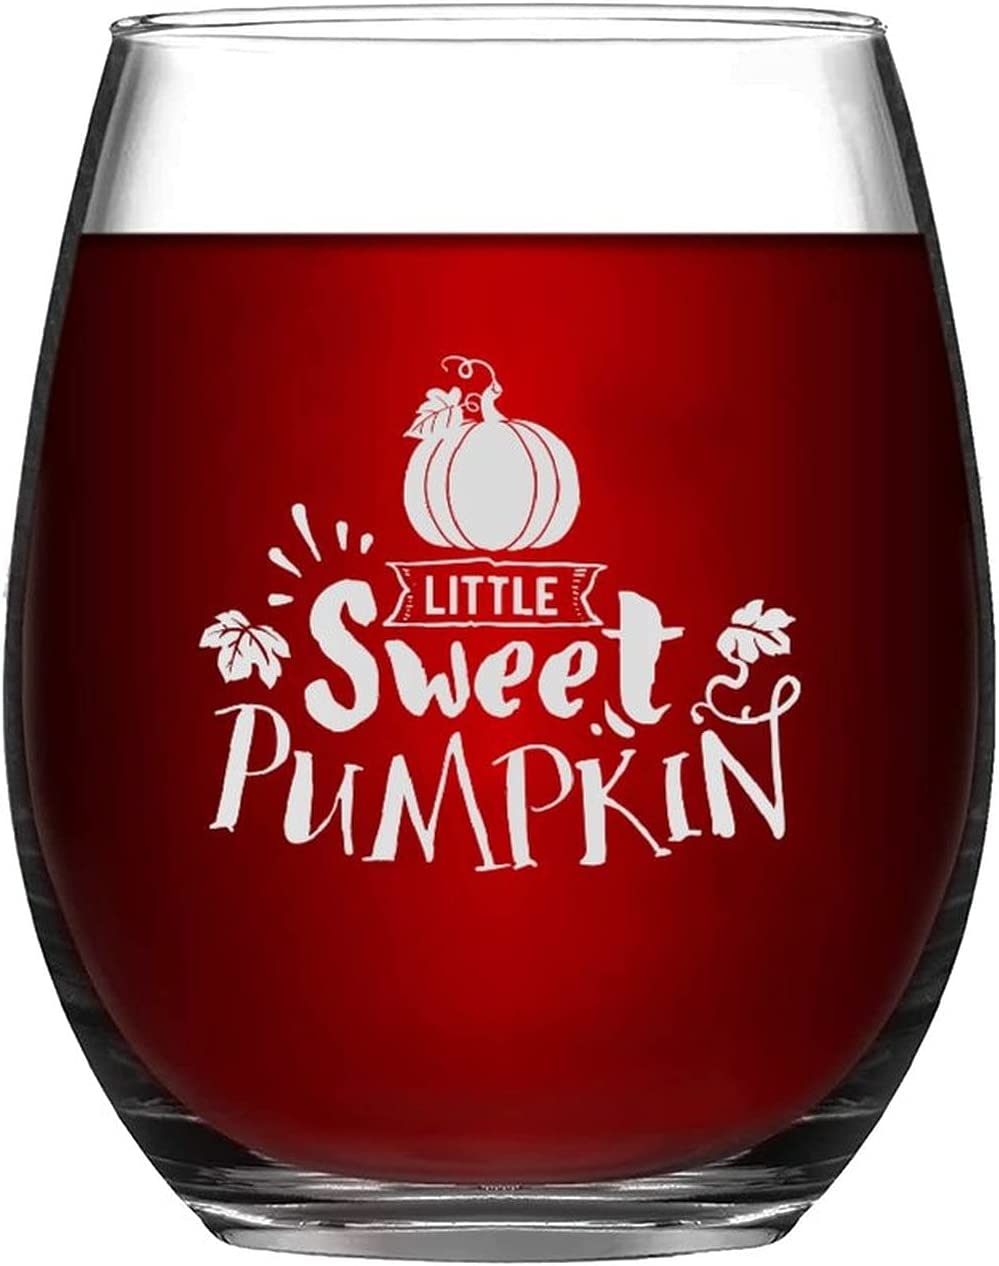 Stemless Wine Glass Little Sweet Autumn Pumpkin Glasses Daily bargain sale Happy Ha Oakland Mall